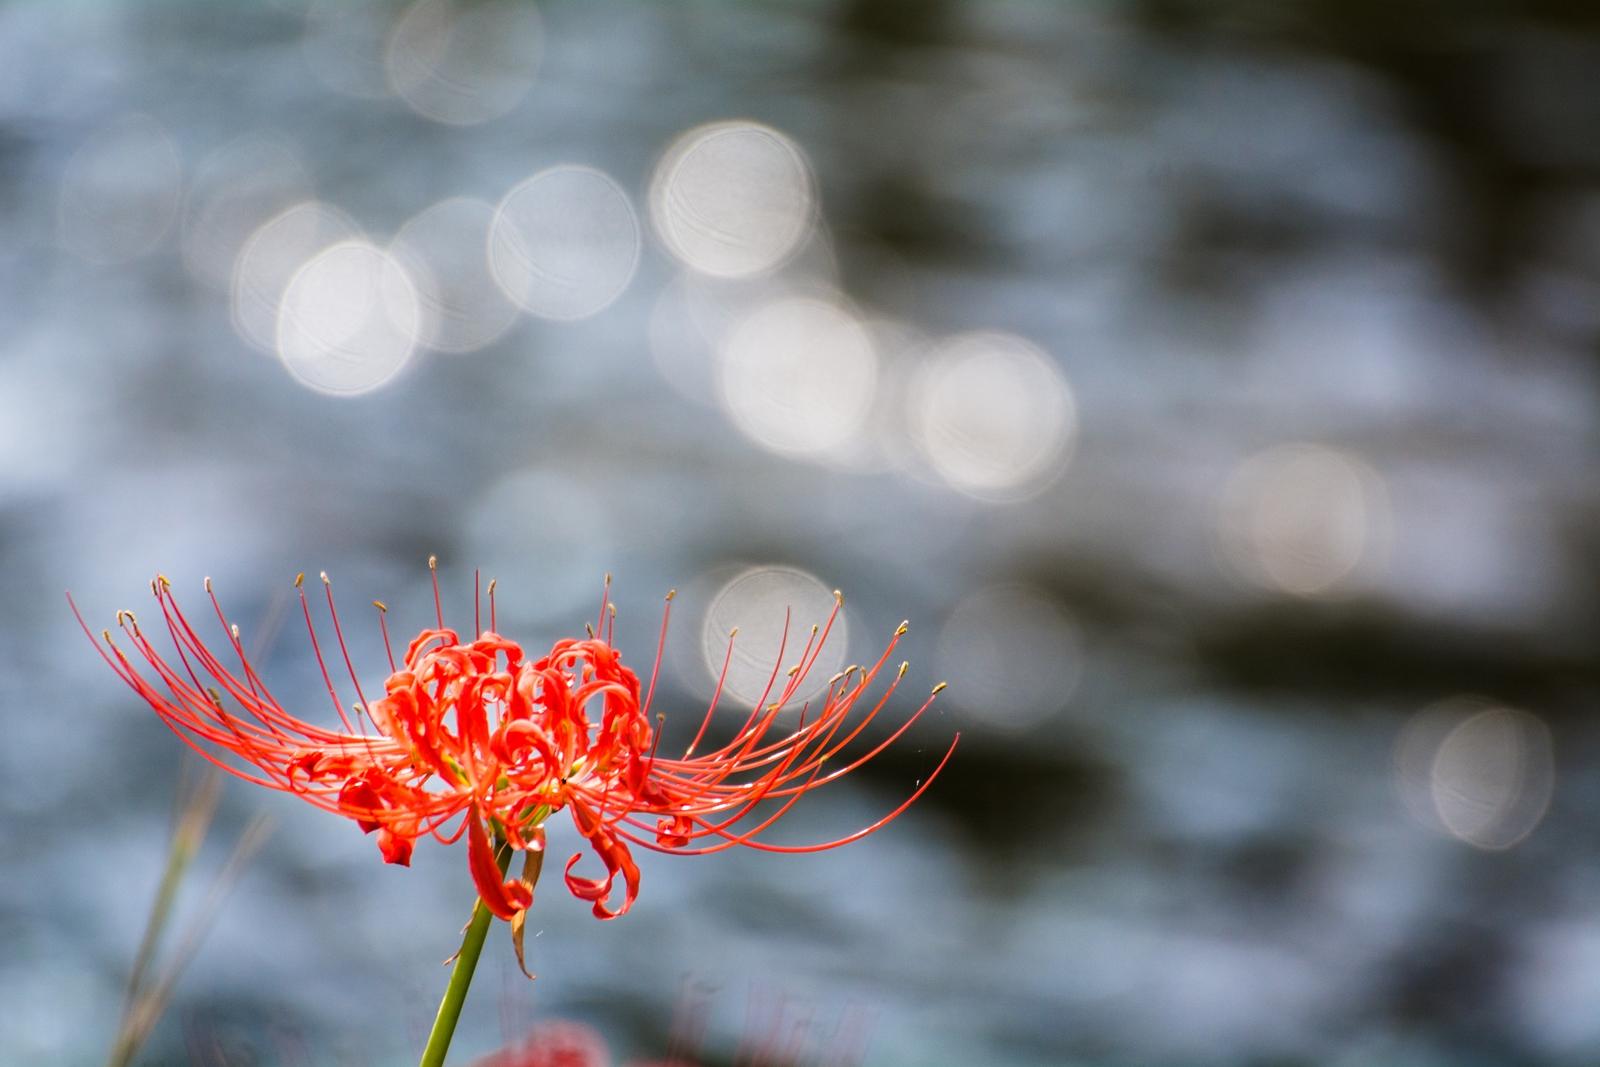 Photo: めぐる季節に別れを告げて Say goodbye to circle of life.  ゆったりとした水の流れ 流れは季節を運びめぐらせる 傍らに咲く曼珠沙華も 別れを告げるかのように 柔らかな光りをそっとこぼしていく  Photo of red spider lily. (二ヶ領の彼岸花) Nikon D7100 APO 50-500mm F4.5-6.3 DG OS HSM #flower #nature #cooljapan #100tokyo #365cooljapanmay [ Day145, October 4th ]